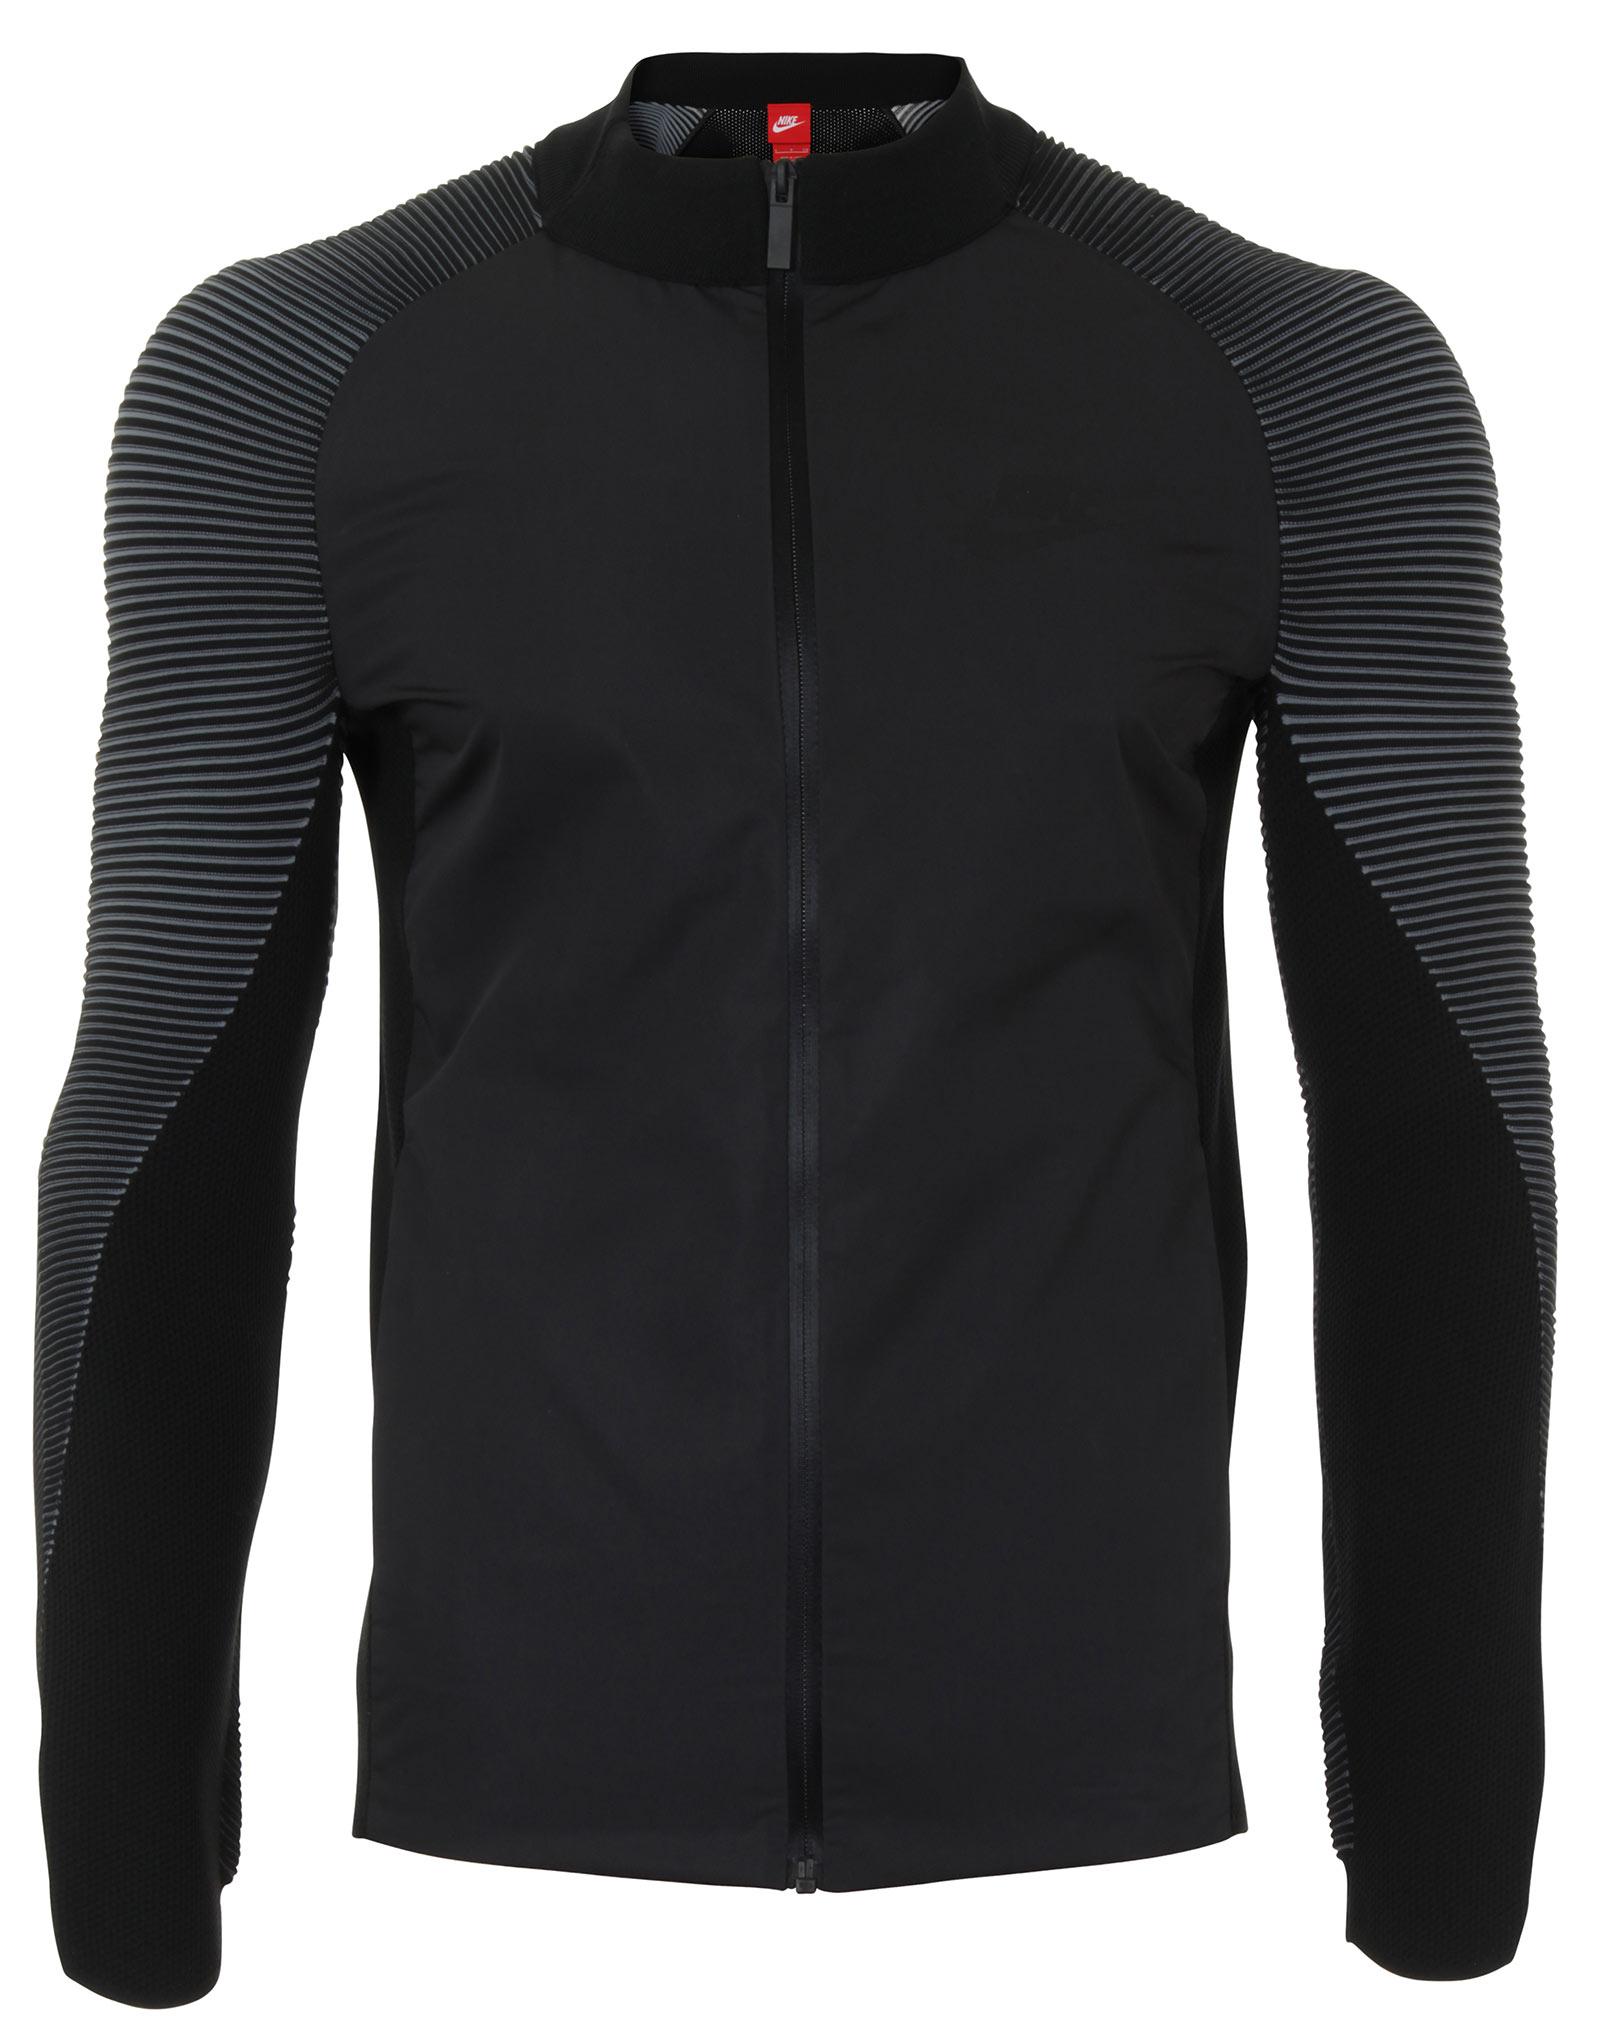 Voici la Dynamic Reveal Jacket de Nike